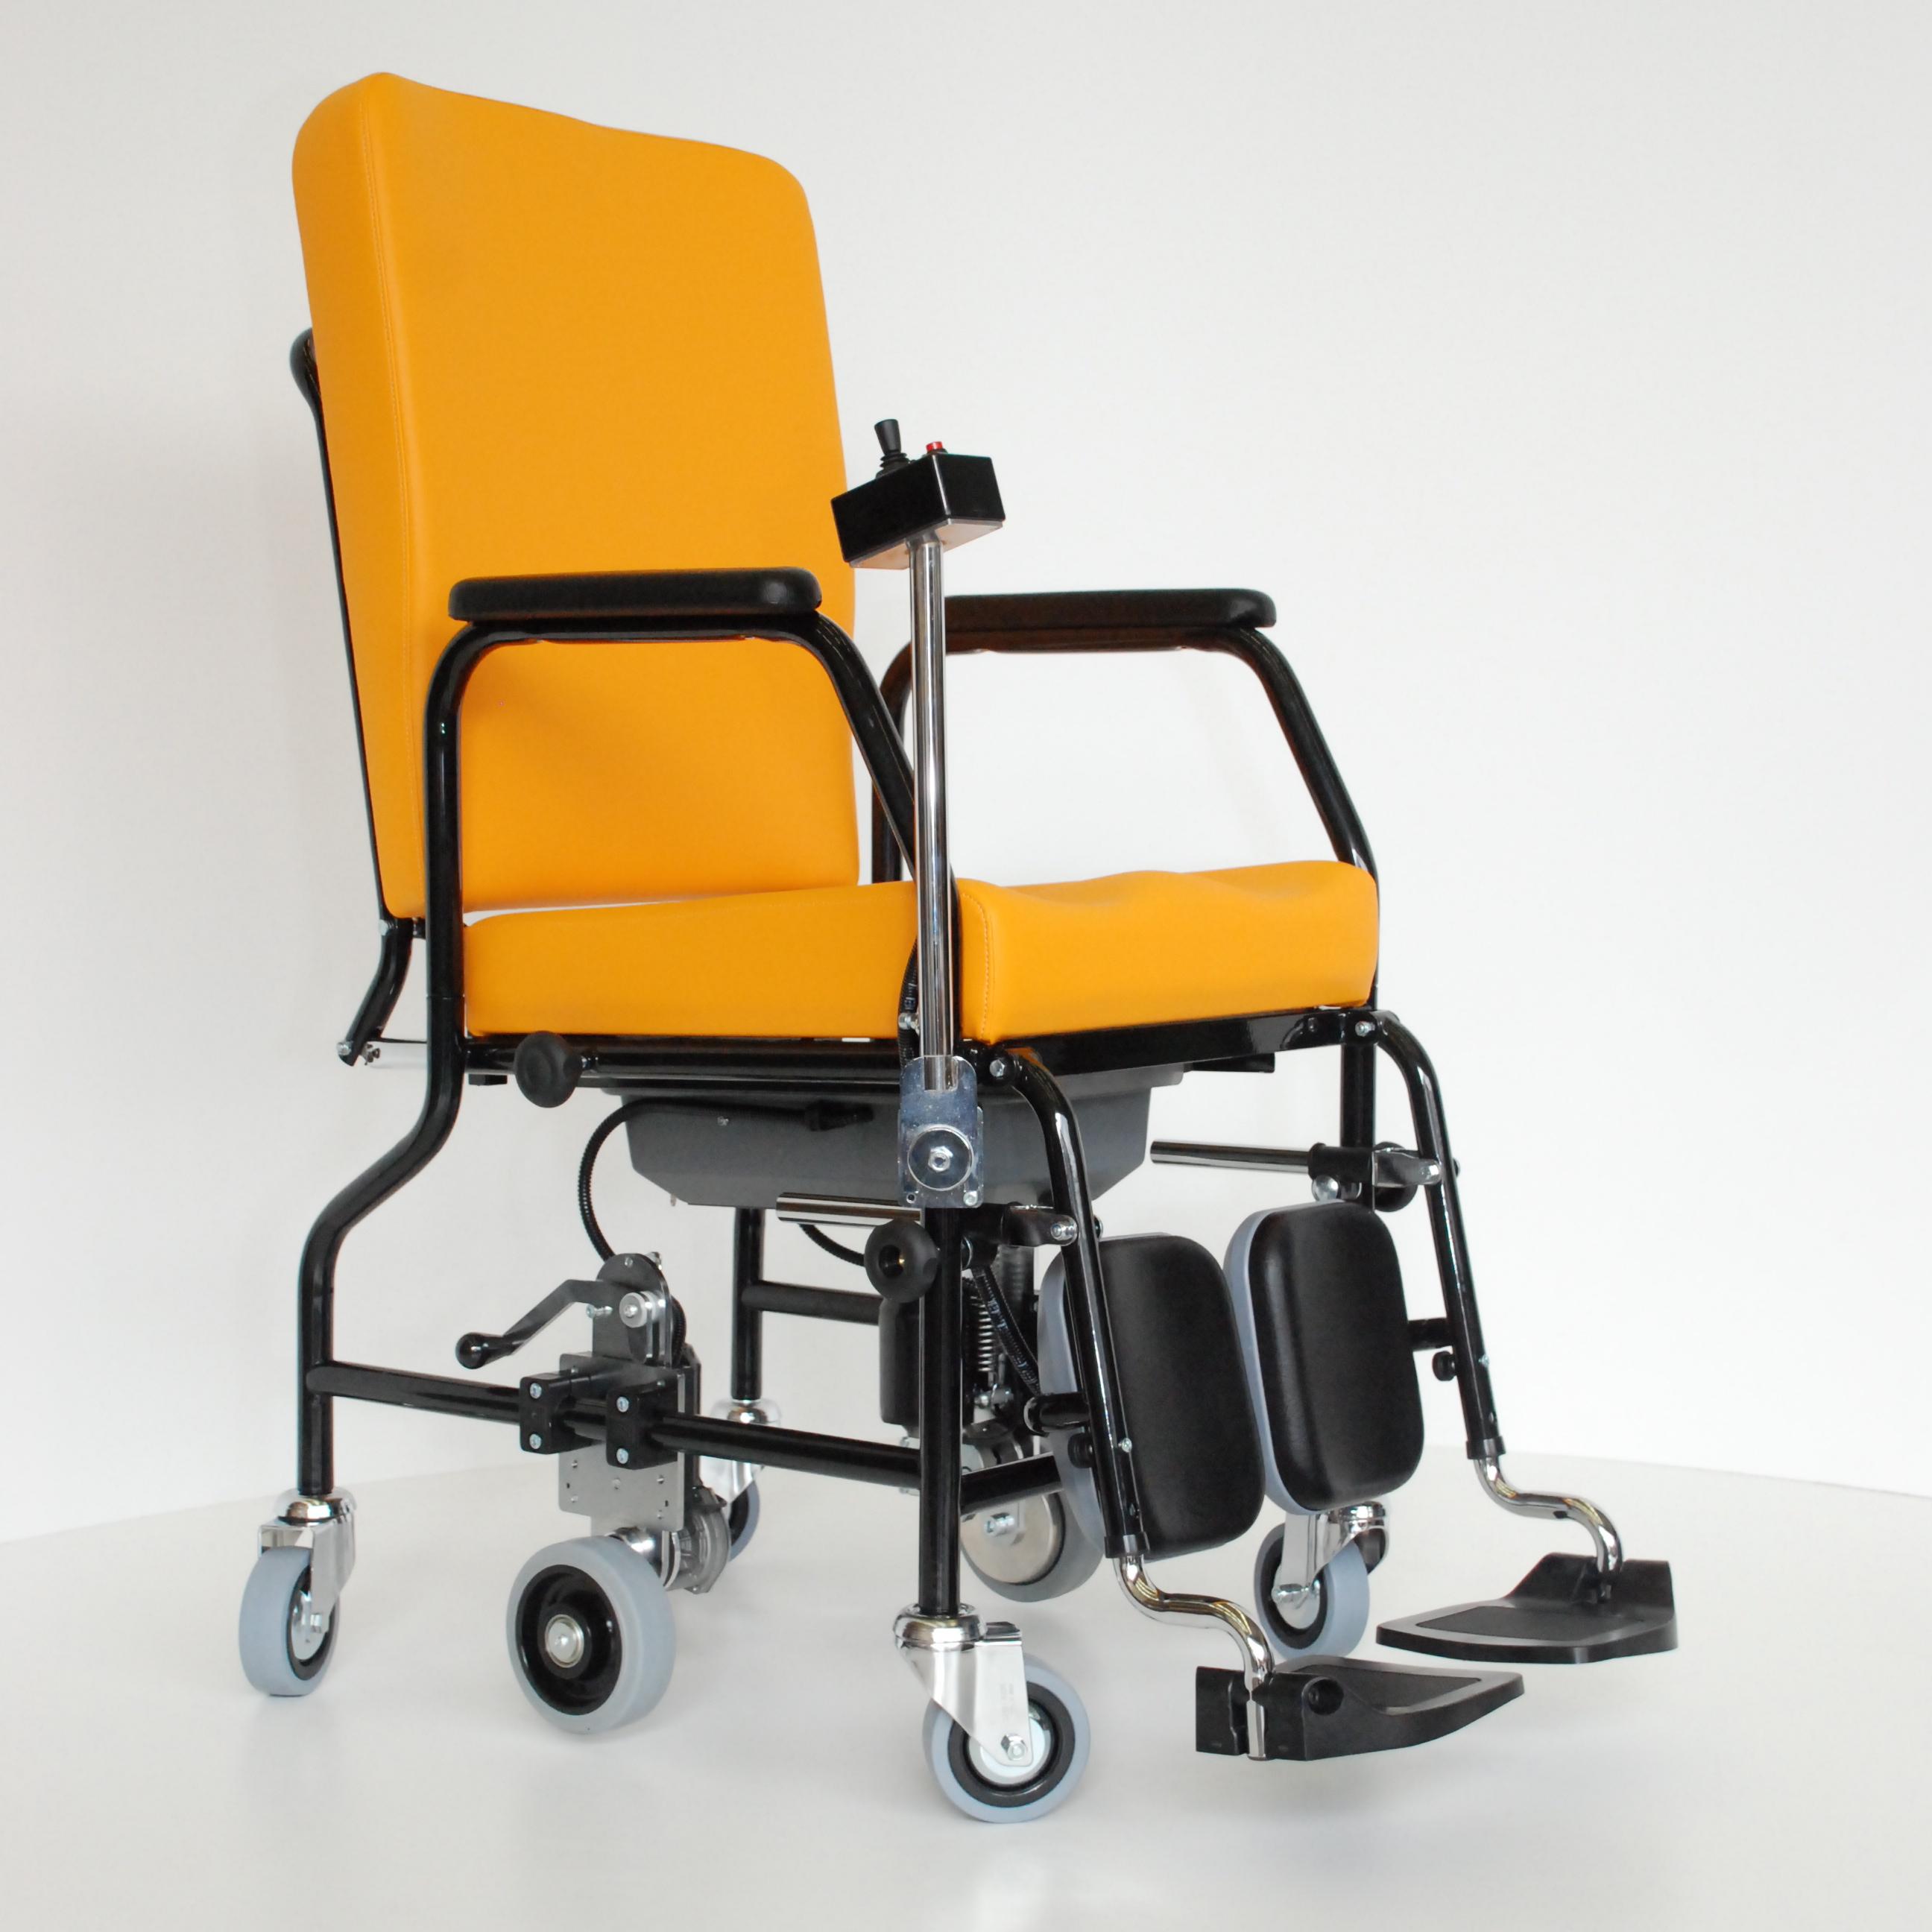 Tec meca snc carrozzine elettriche per disabili - Carrozzina per bagno disabili ...